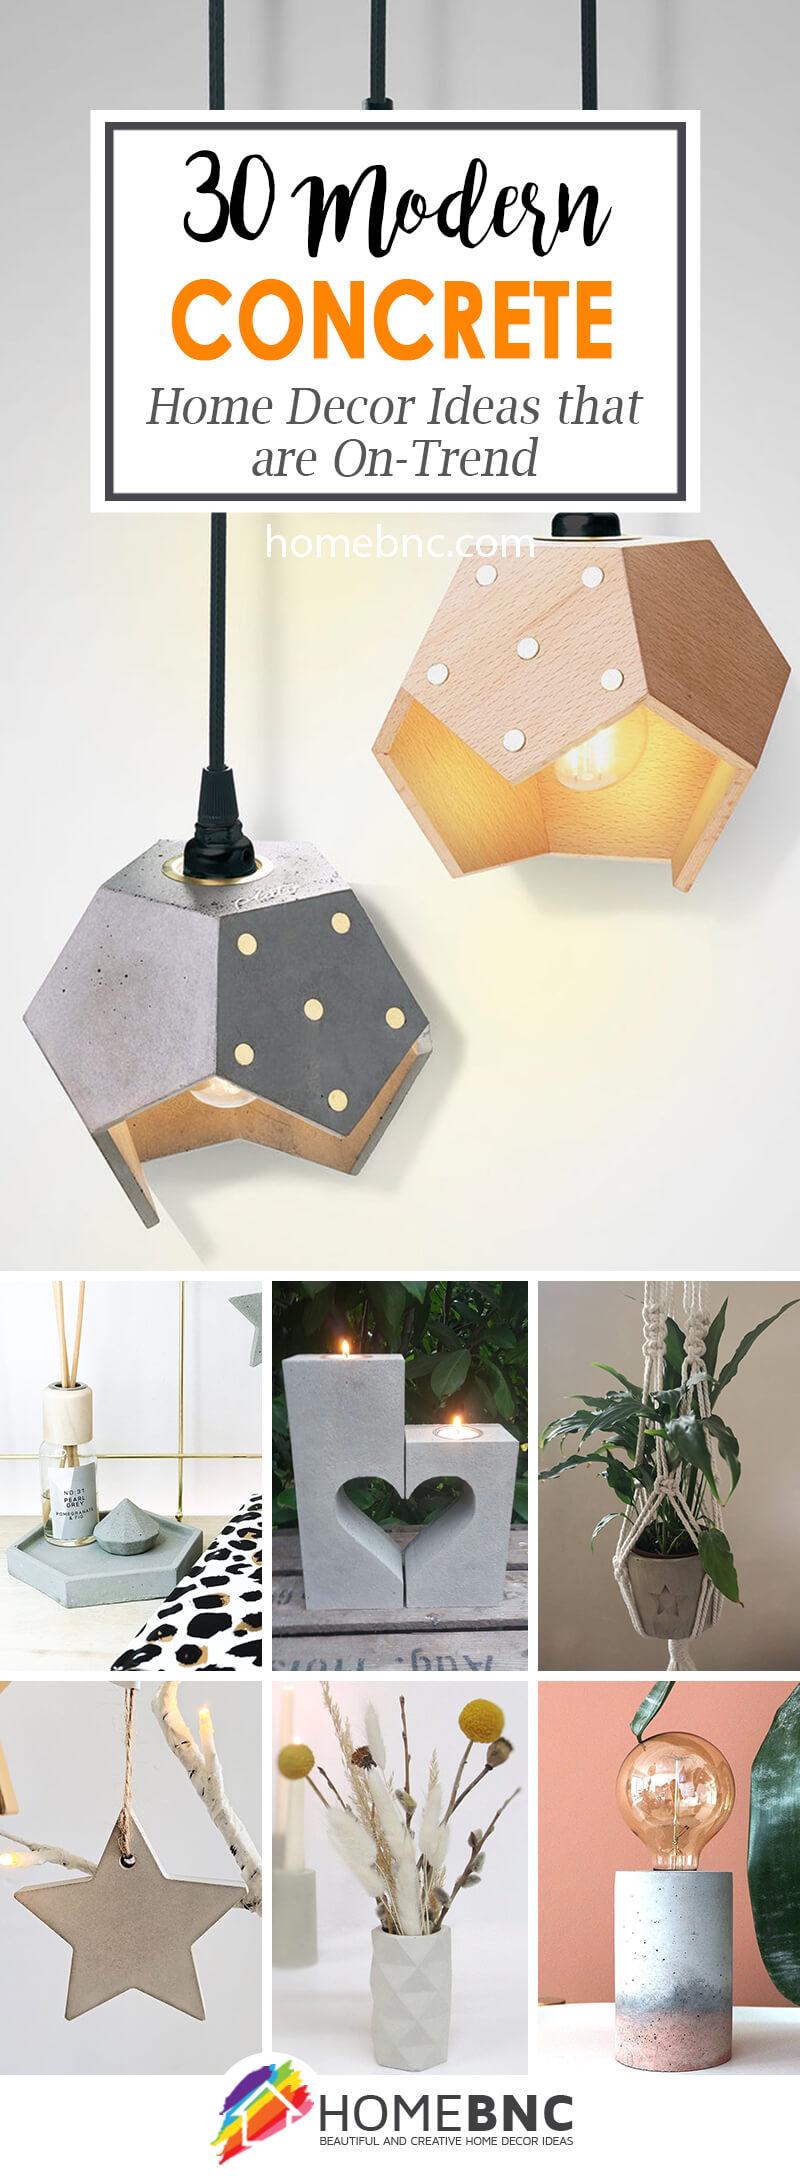 Best Modern Concrete Home Decor Ideas